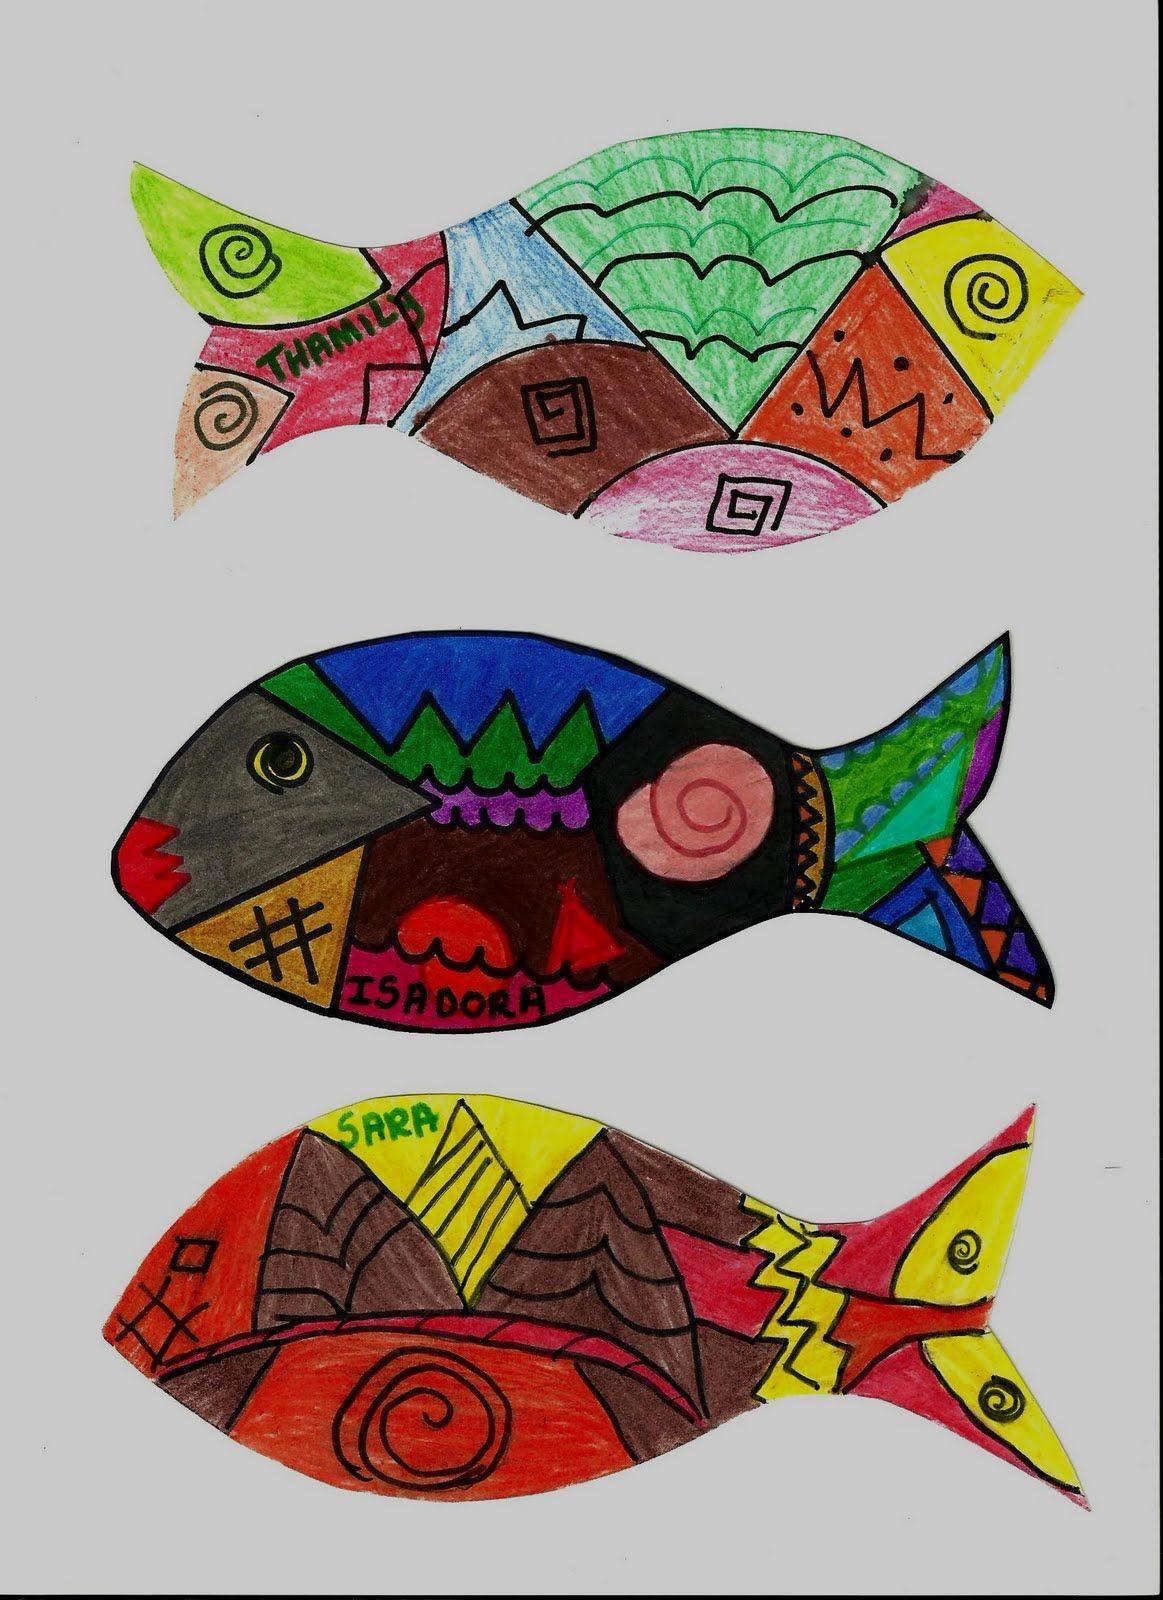 Peixes Com Grafismos Indigenas Com Imagens Pinturas Indigena